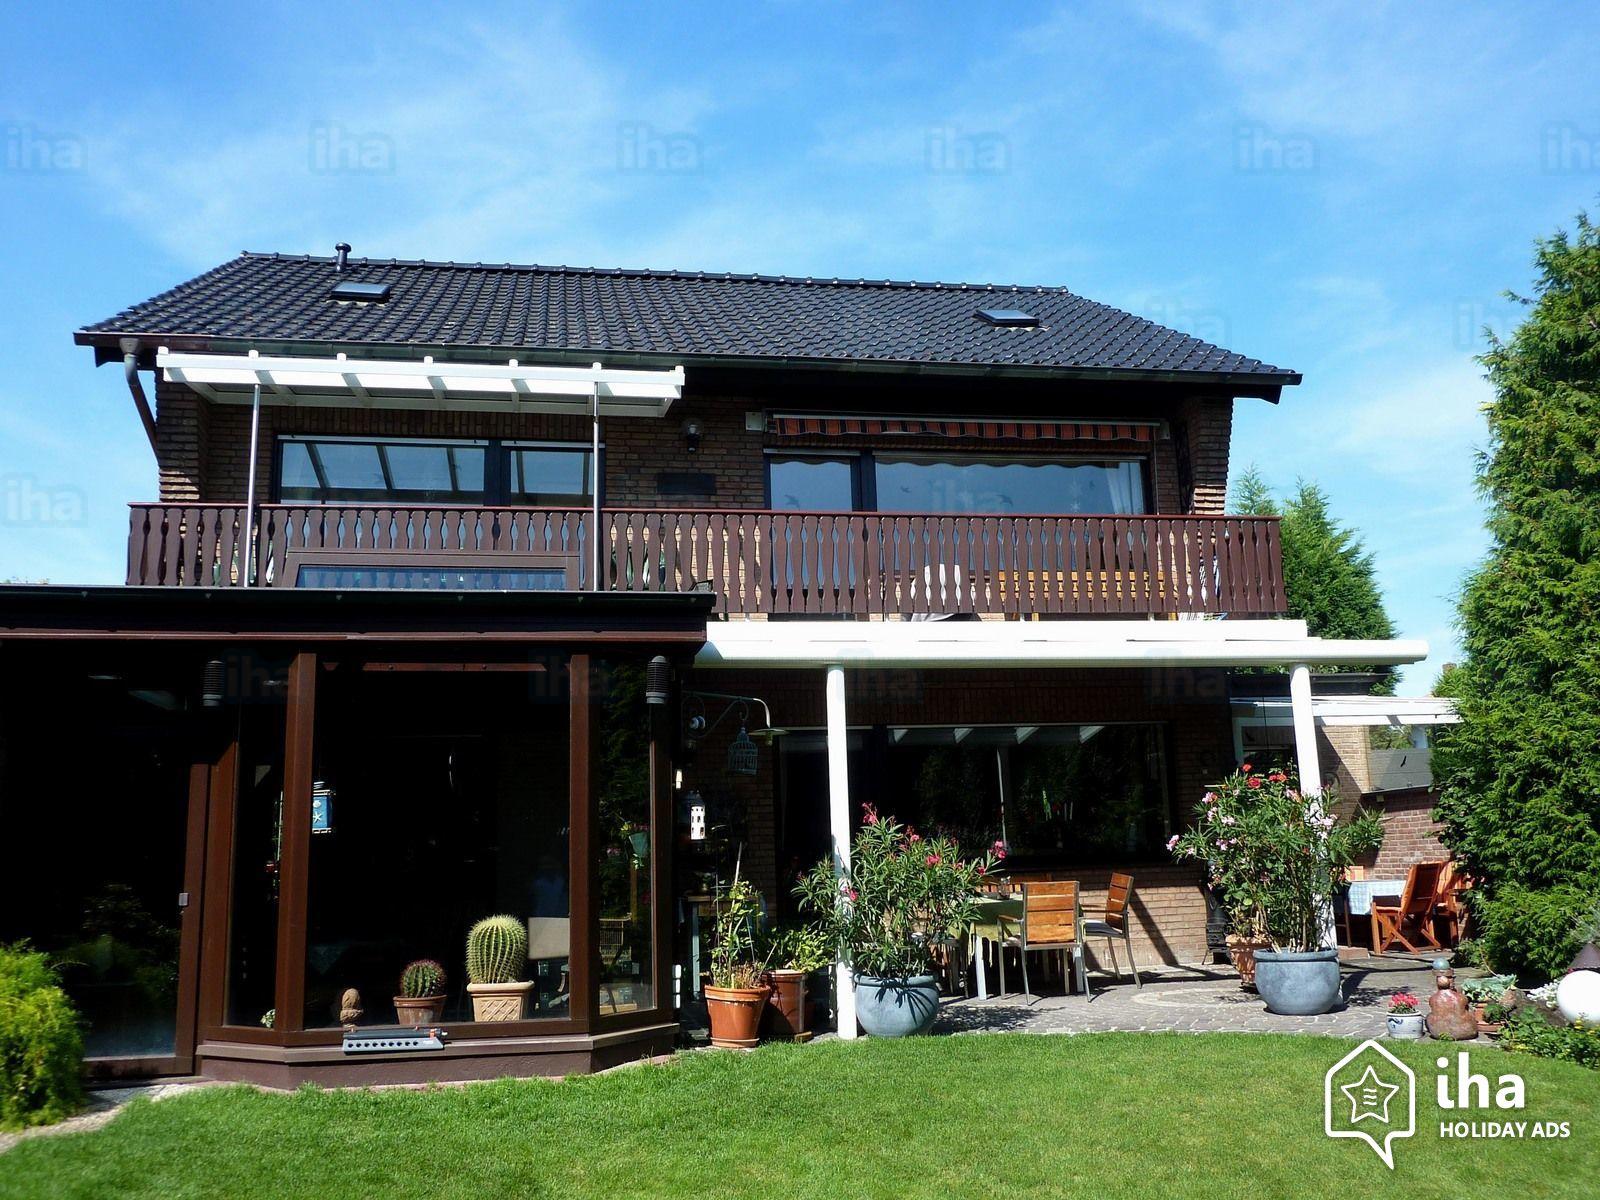 Top 80 Sq Meters House Design - HouseDesignsme